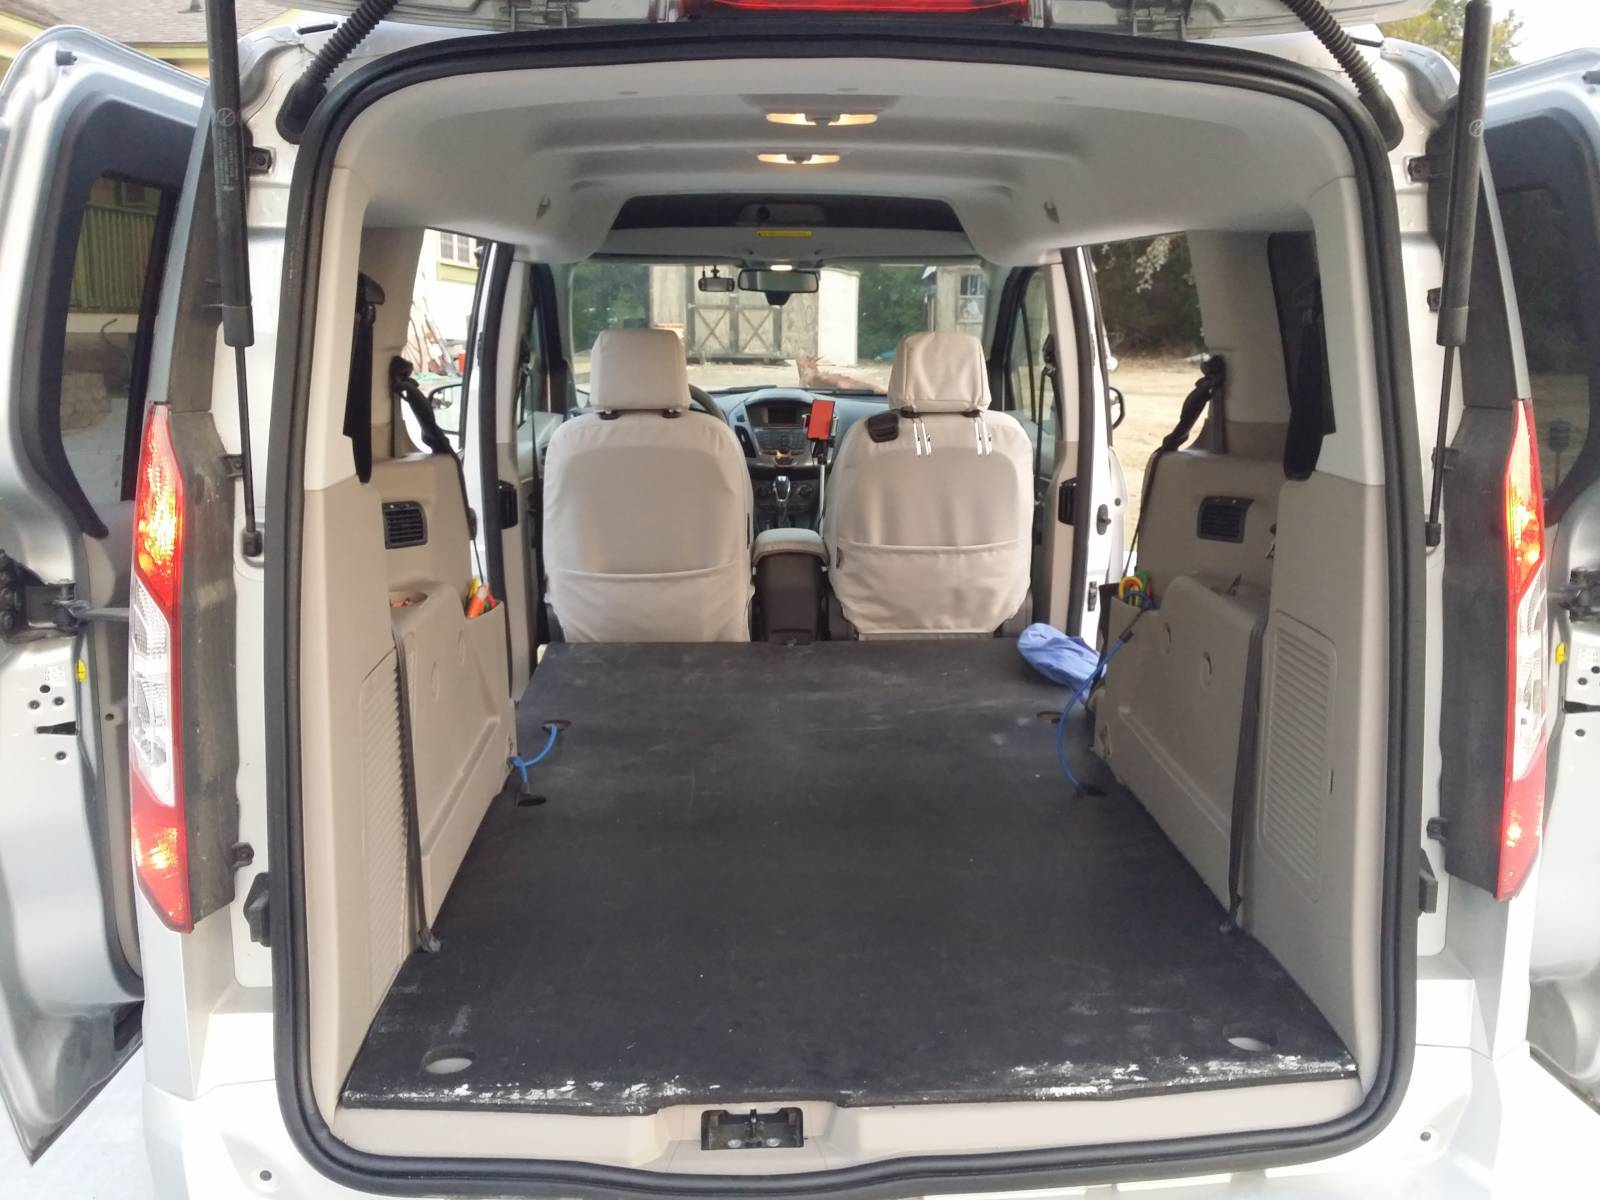 2015 TC LWB Wagon Modifications